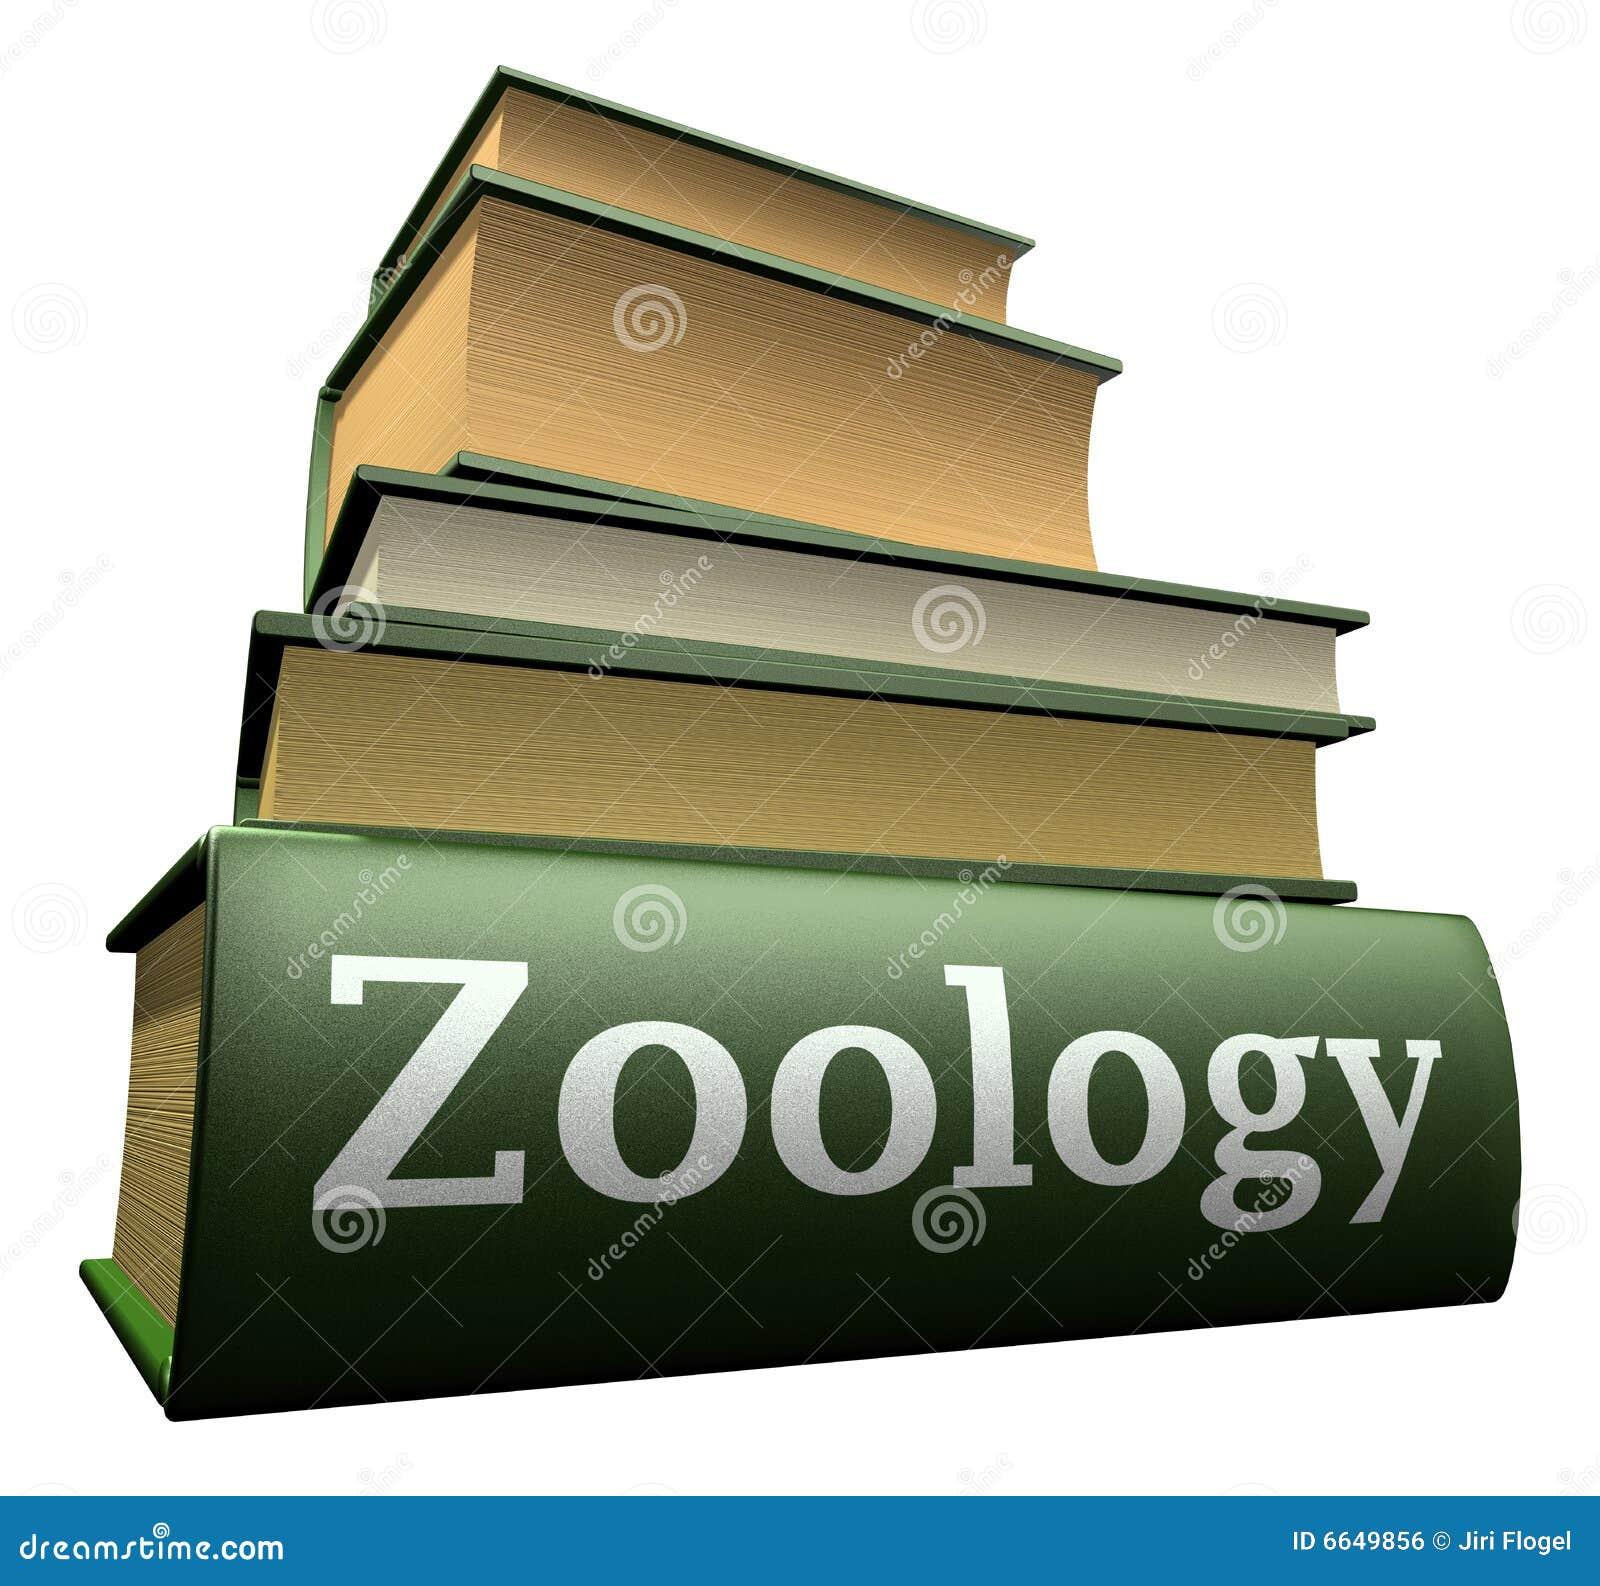 Zoology high school major subject